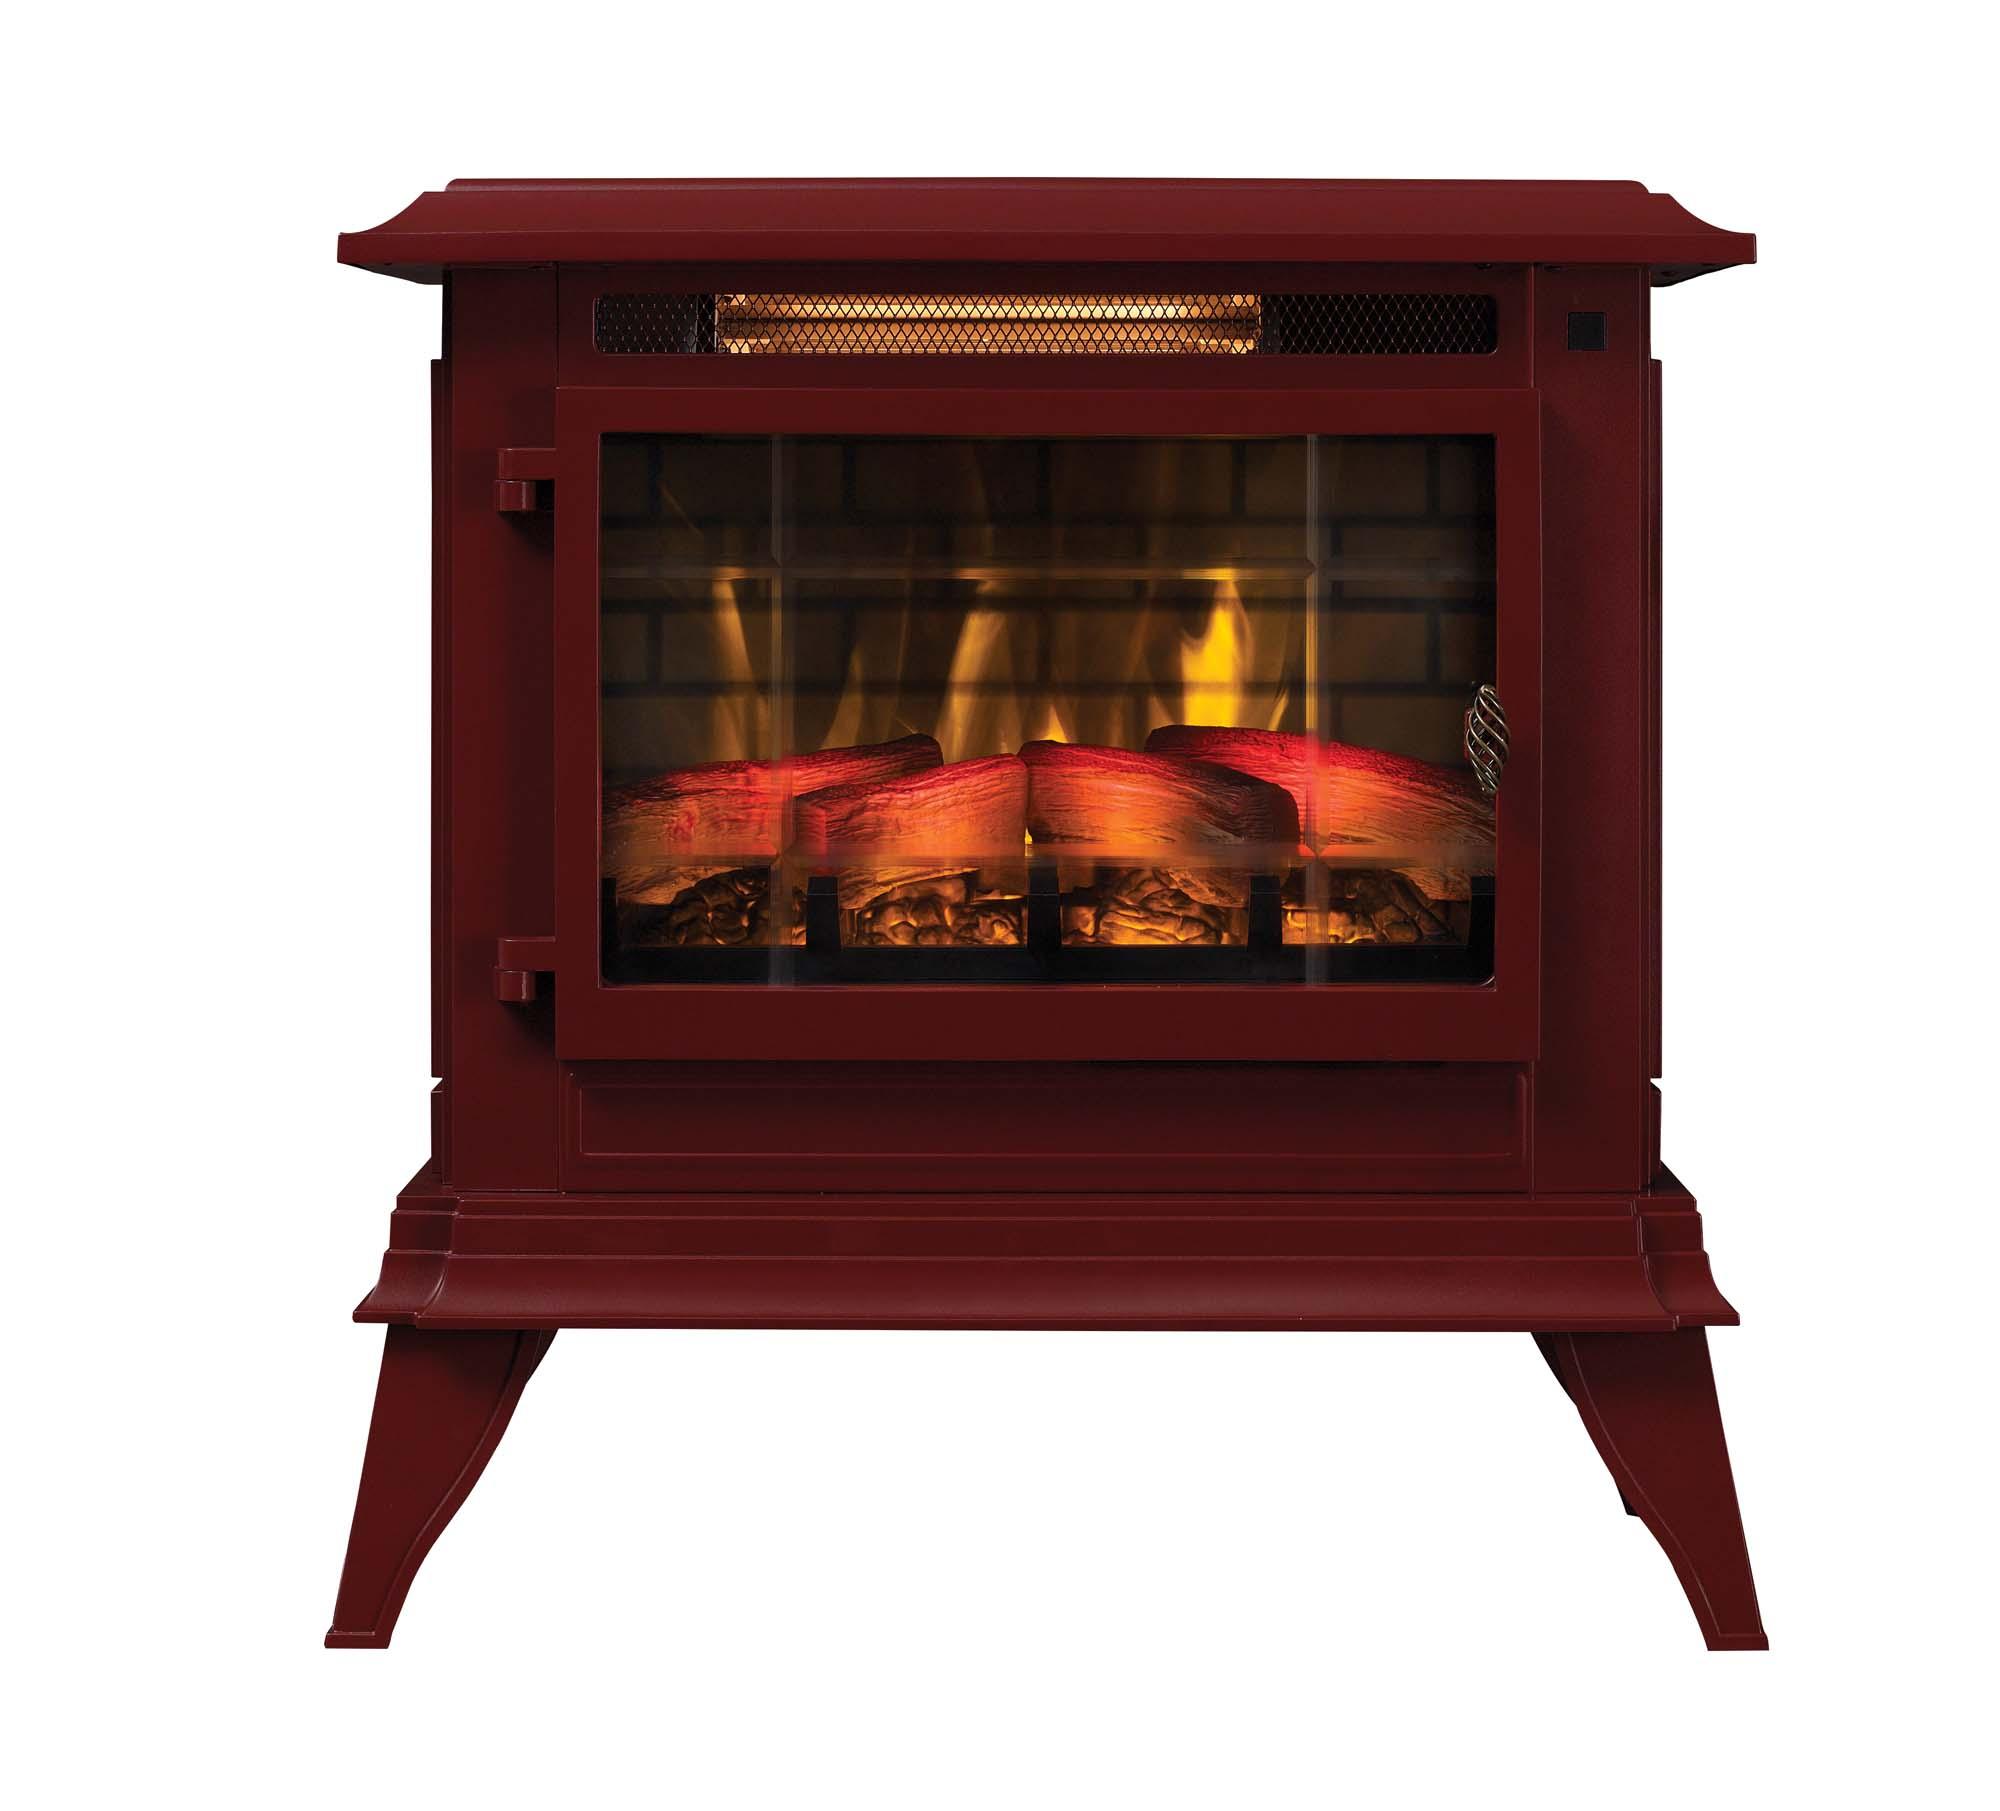 Twin Star International electric fireplace